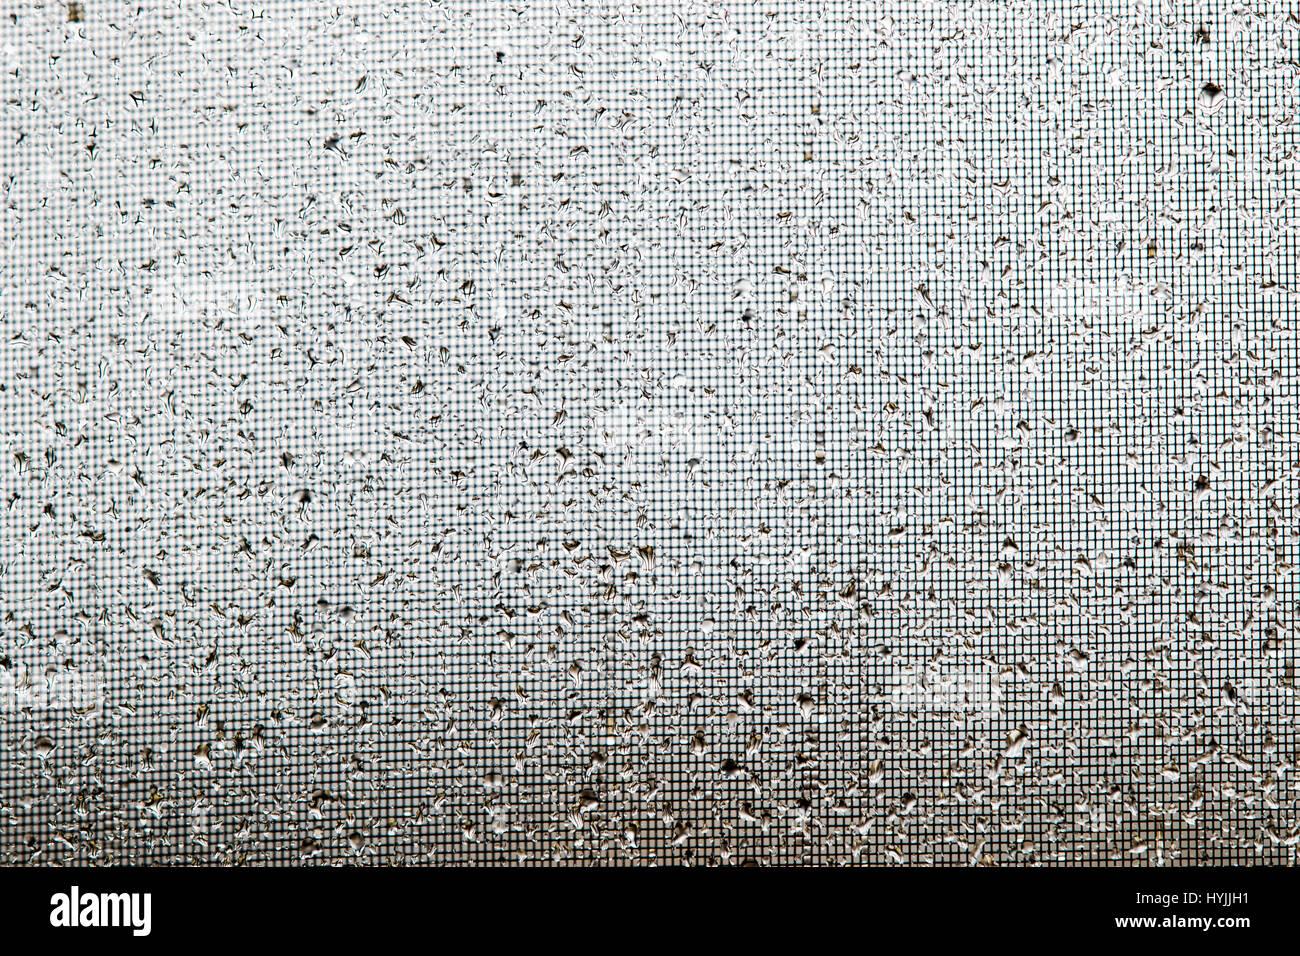 Close-ups of raindrops on a window glass & screen Stock Photo